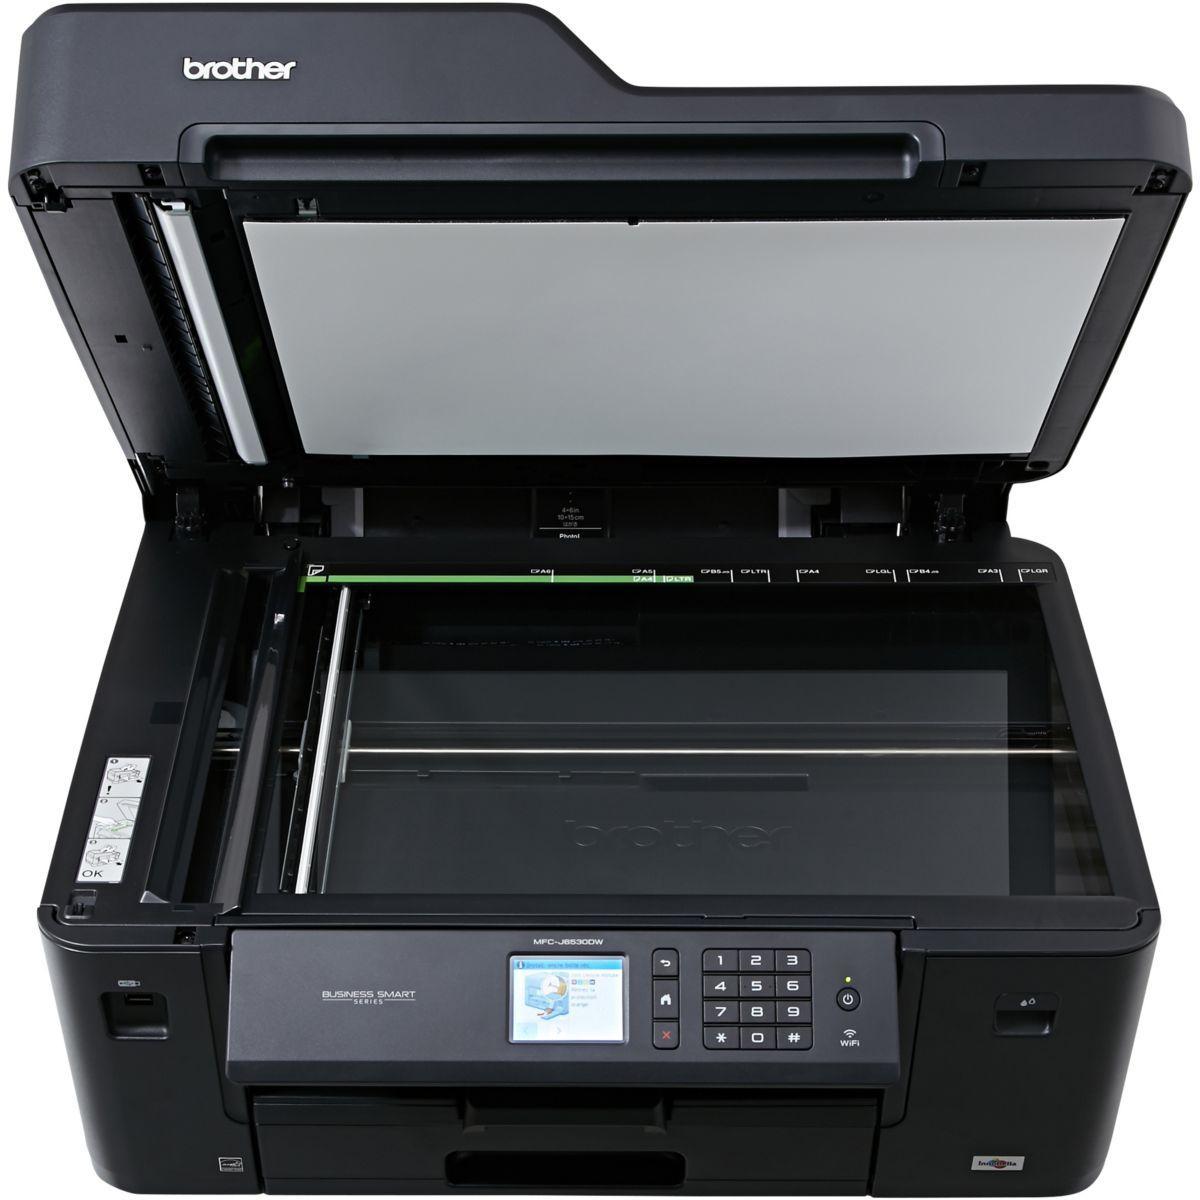 Multifunctionele inkjetprinter Brother MFC-J6530DW - Zwart